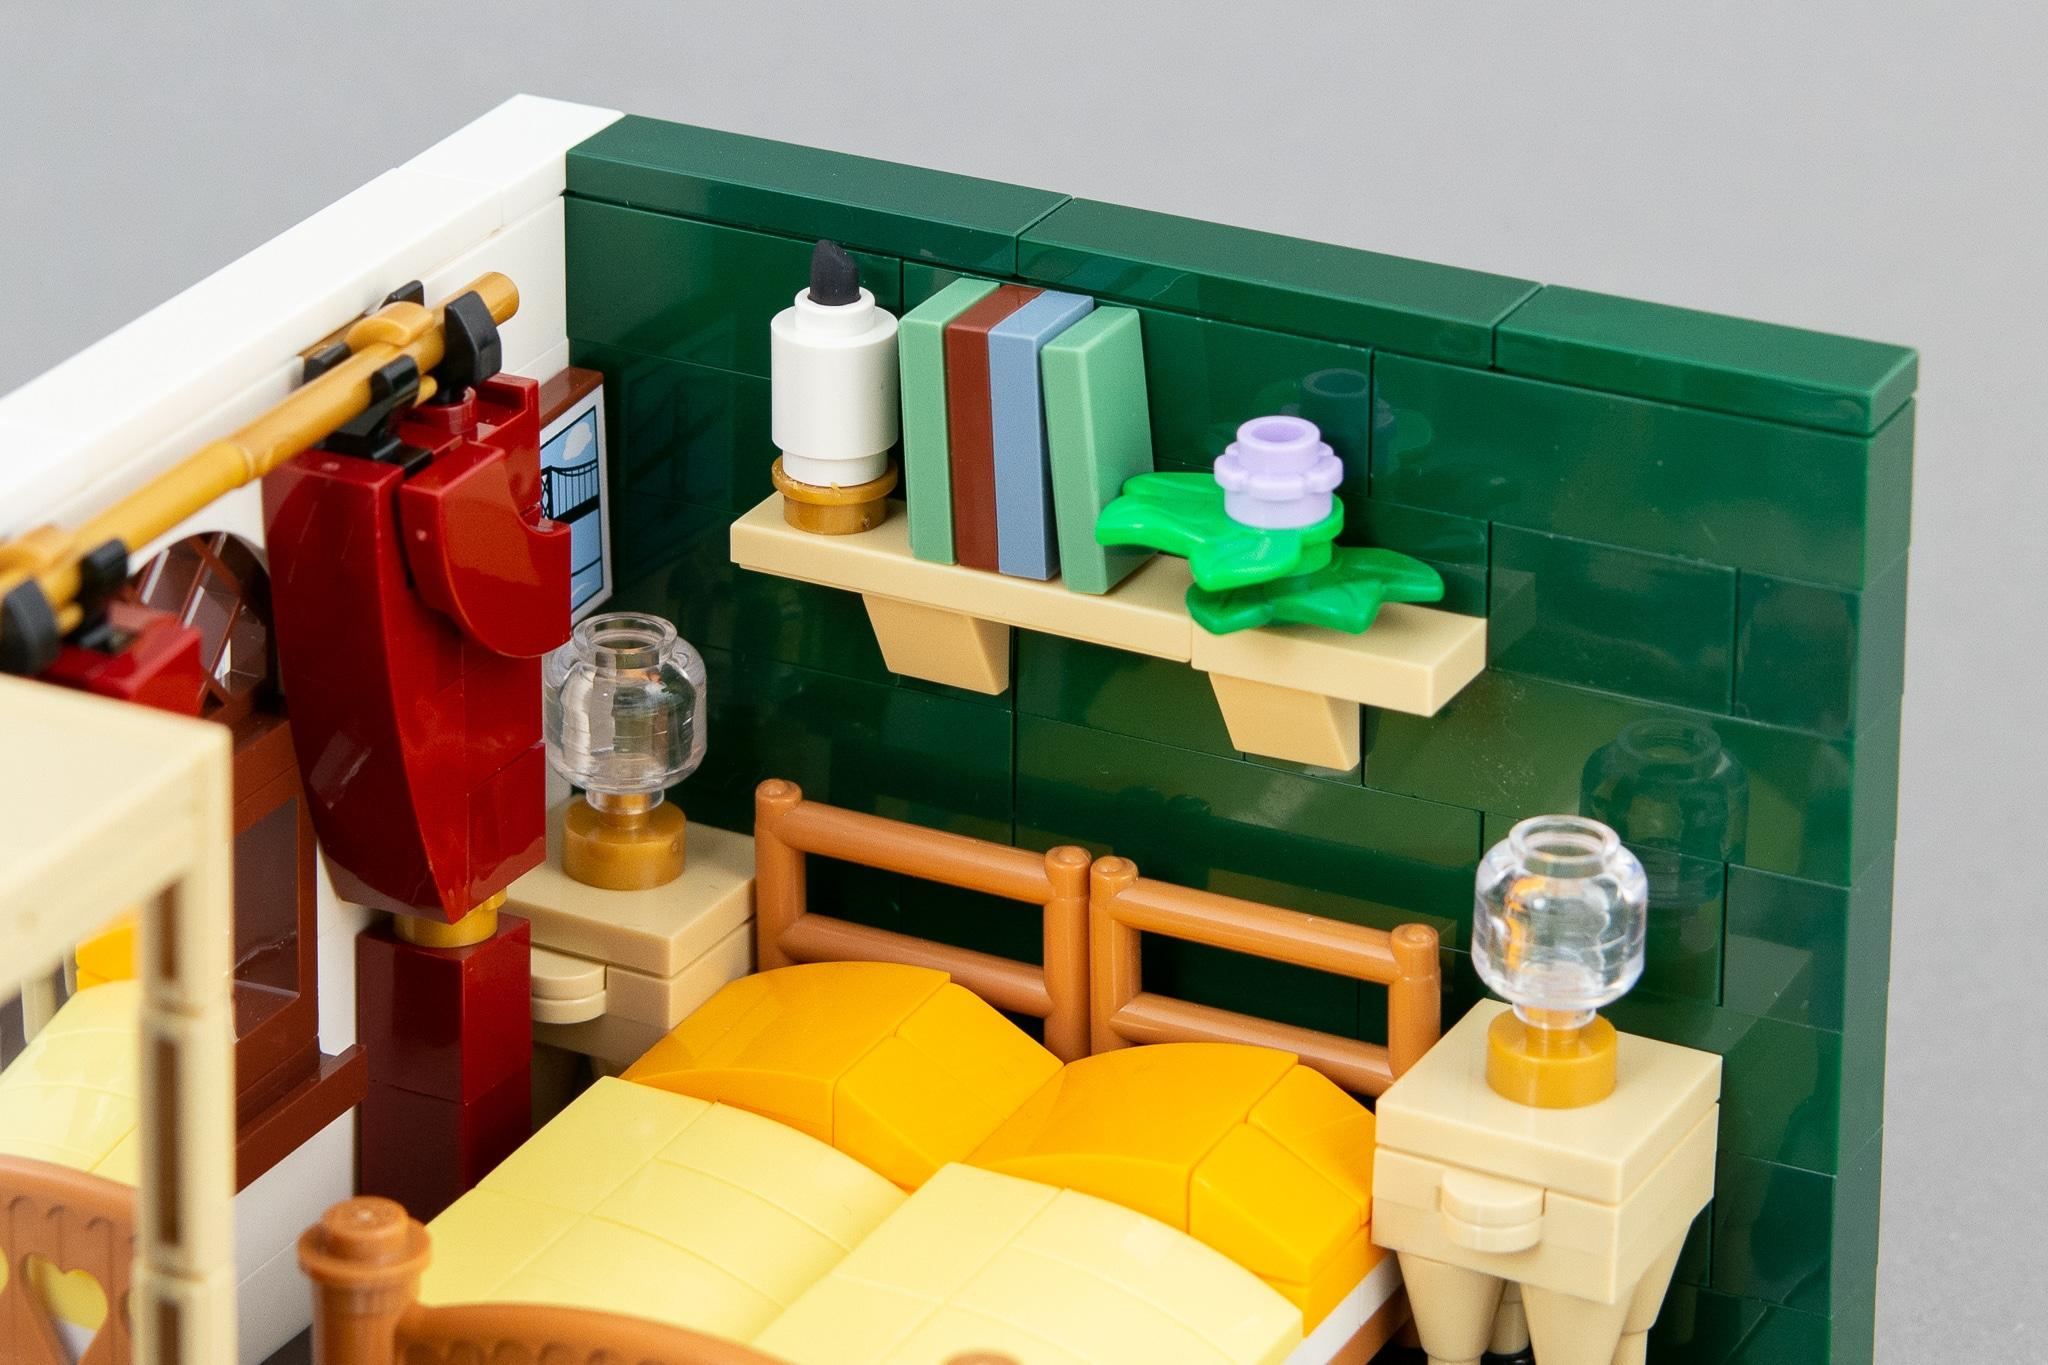 LEGO Schlafzimmer Moc (8)